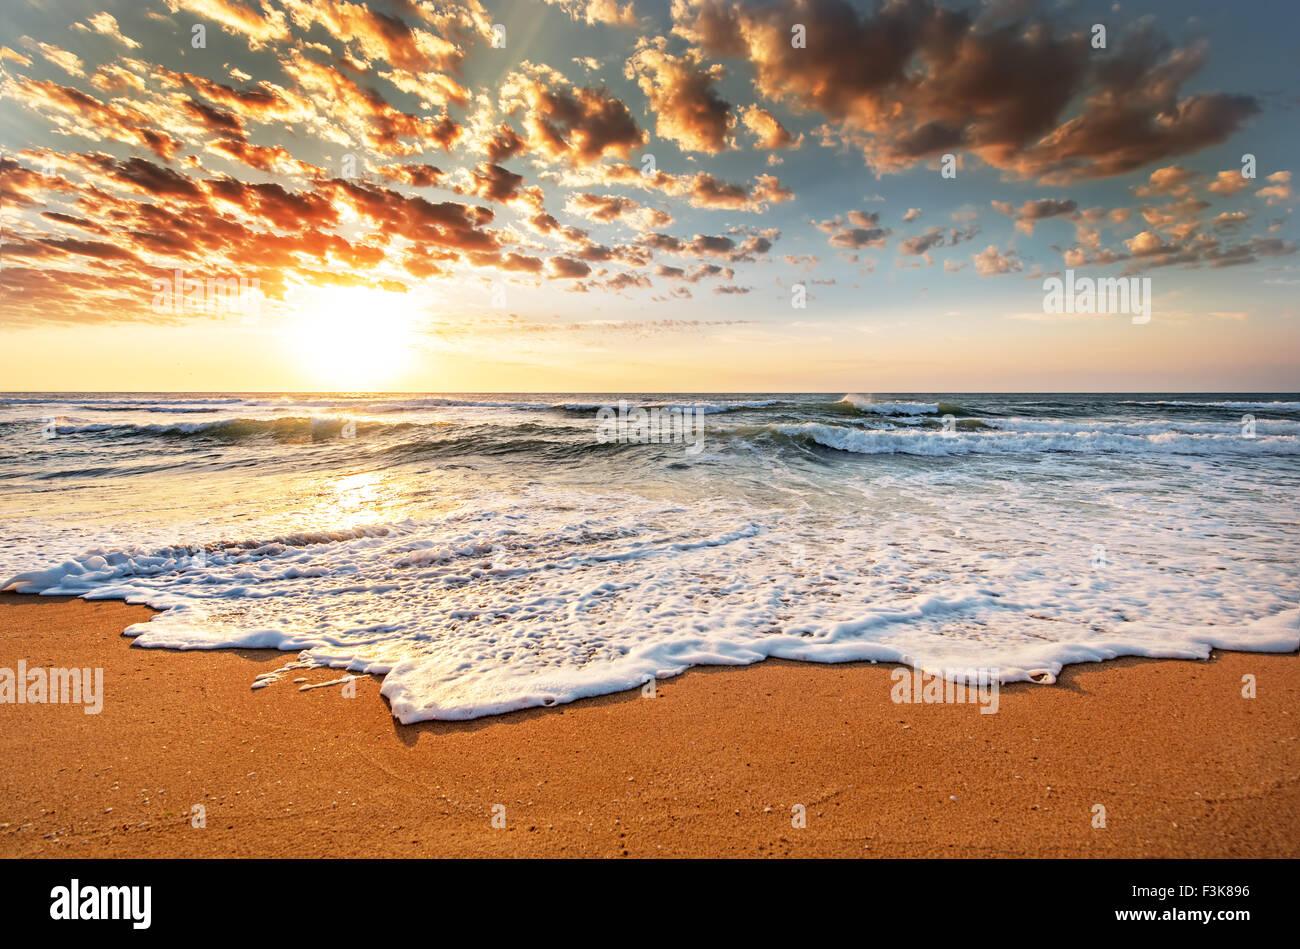 Brillante Ozean Strand Sonnenaufgang. Stockbild